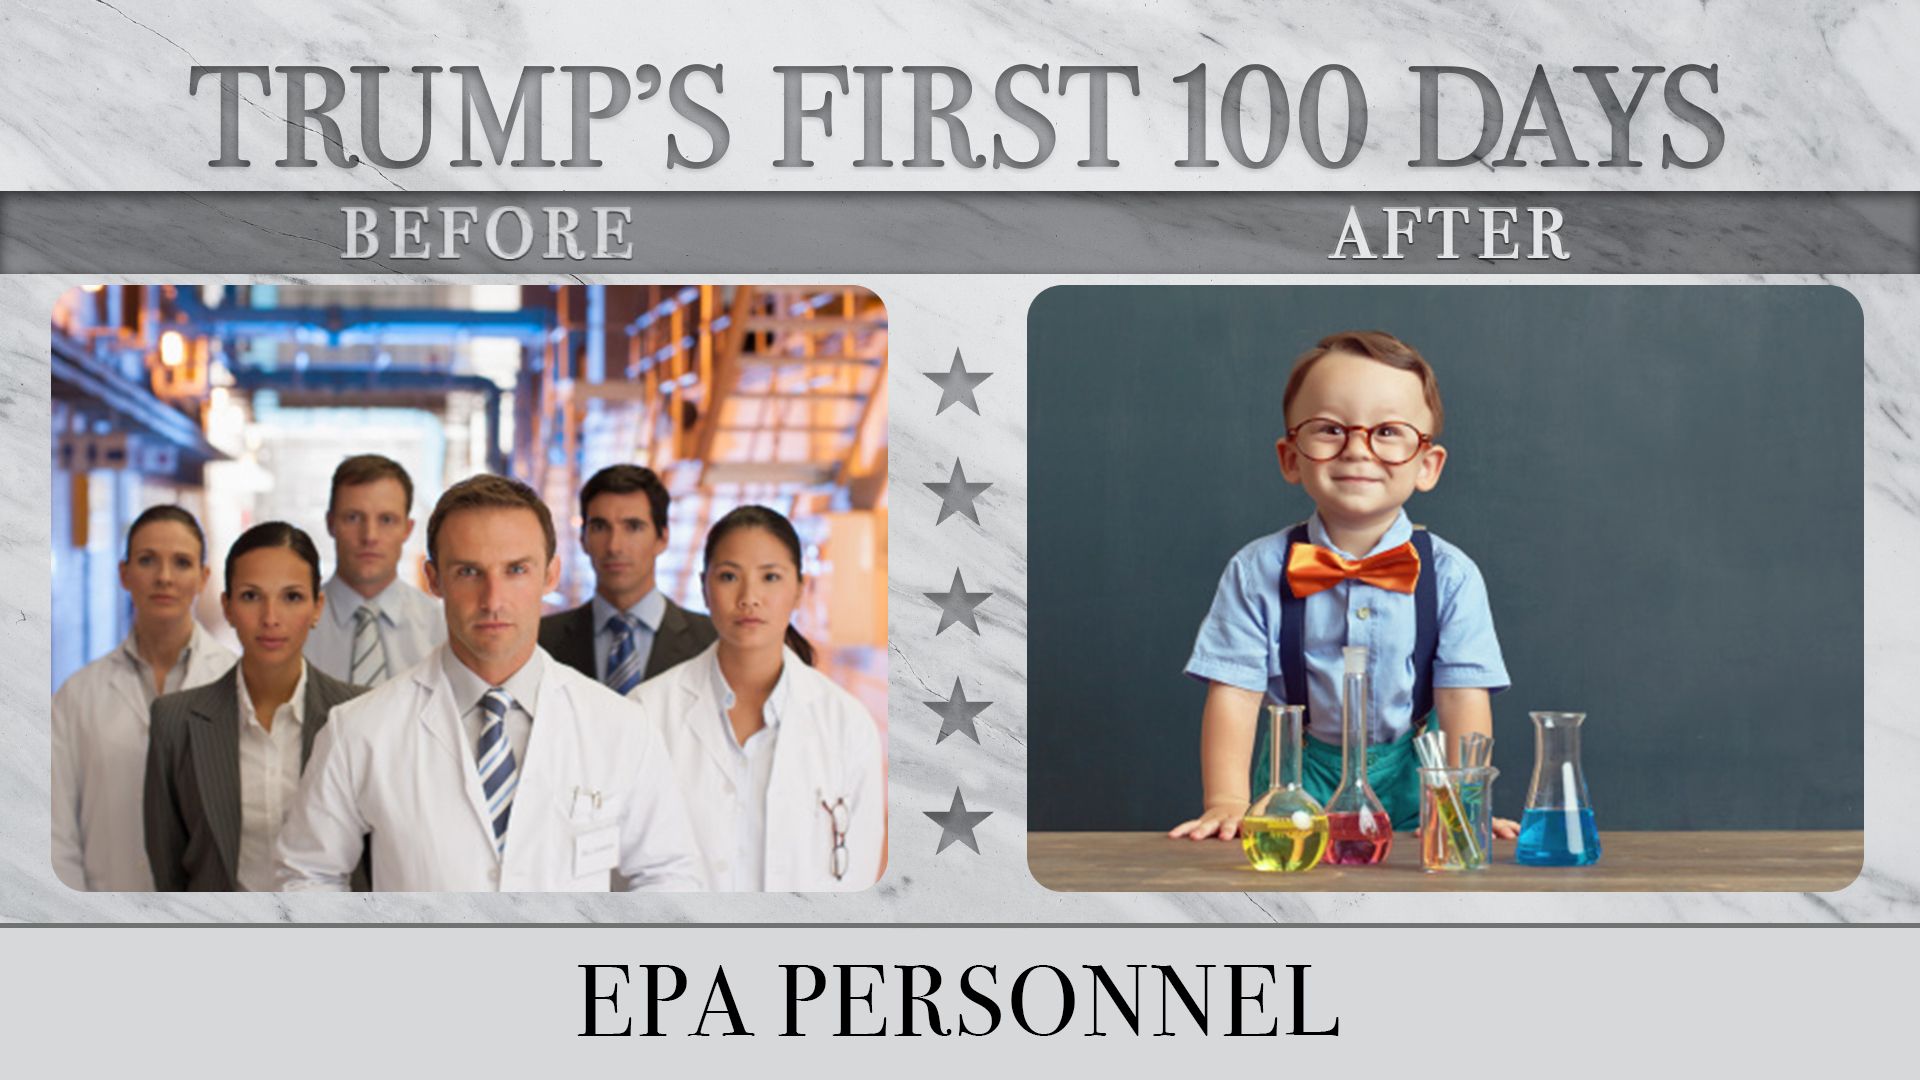 EPA Personnel